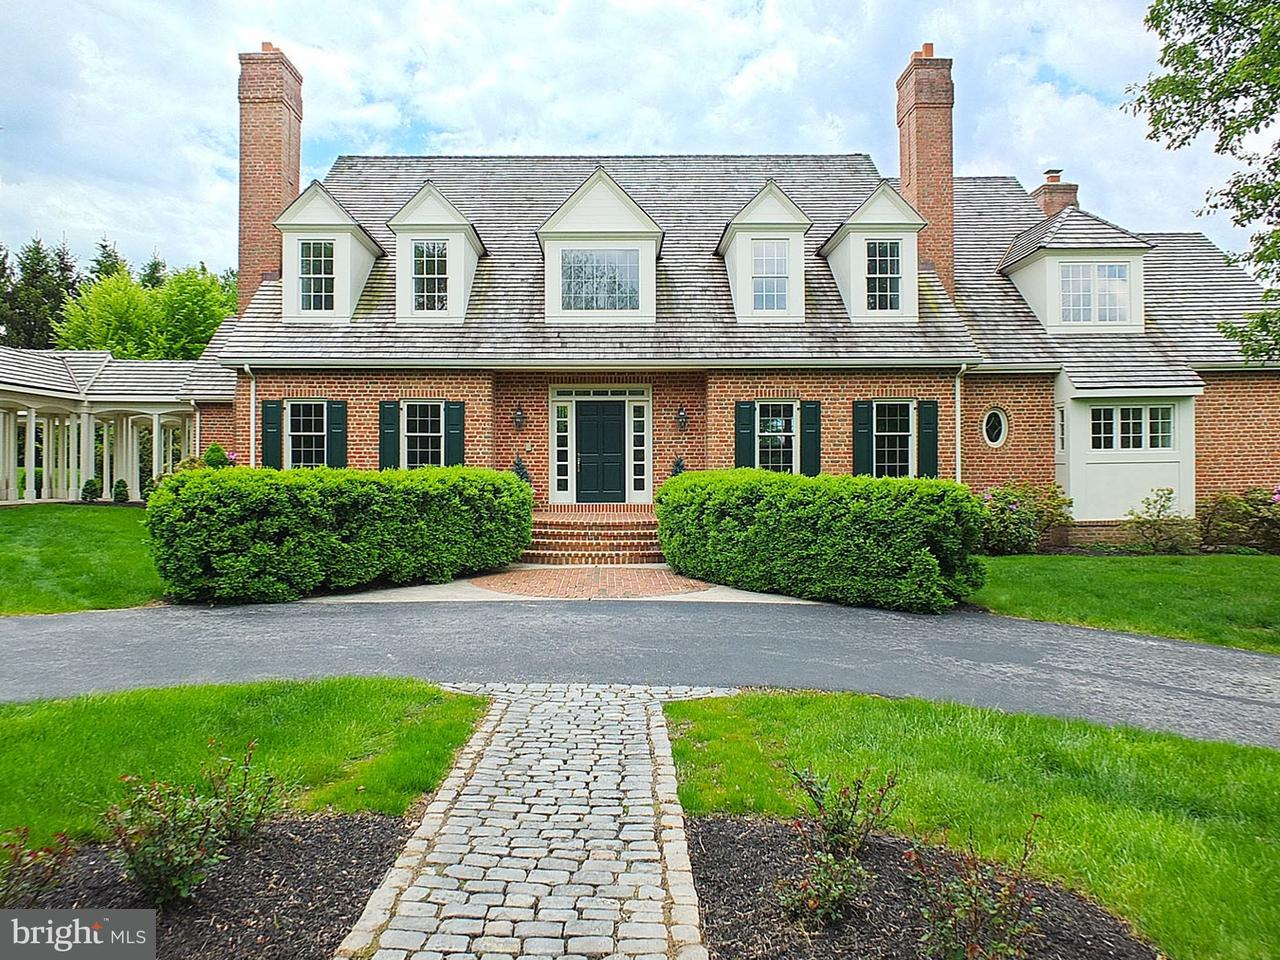 Single Family Home for Sale at 107 MINE Road Malvern, Pennsylvania 19355 United States